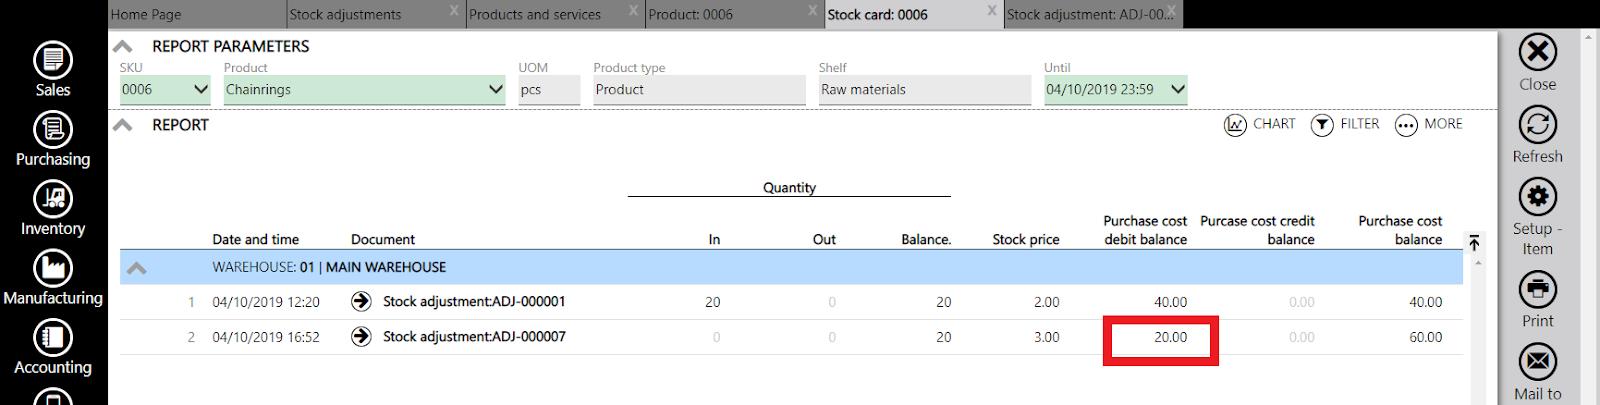 stock adjustment